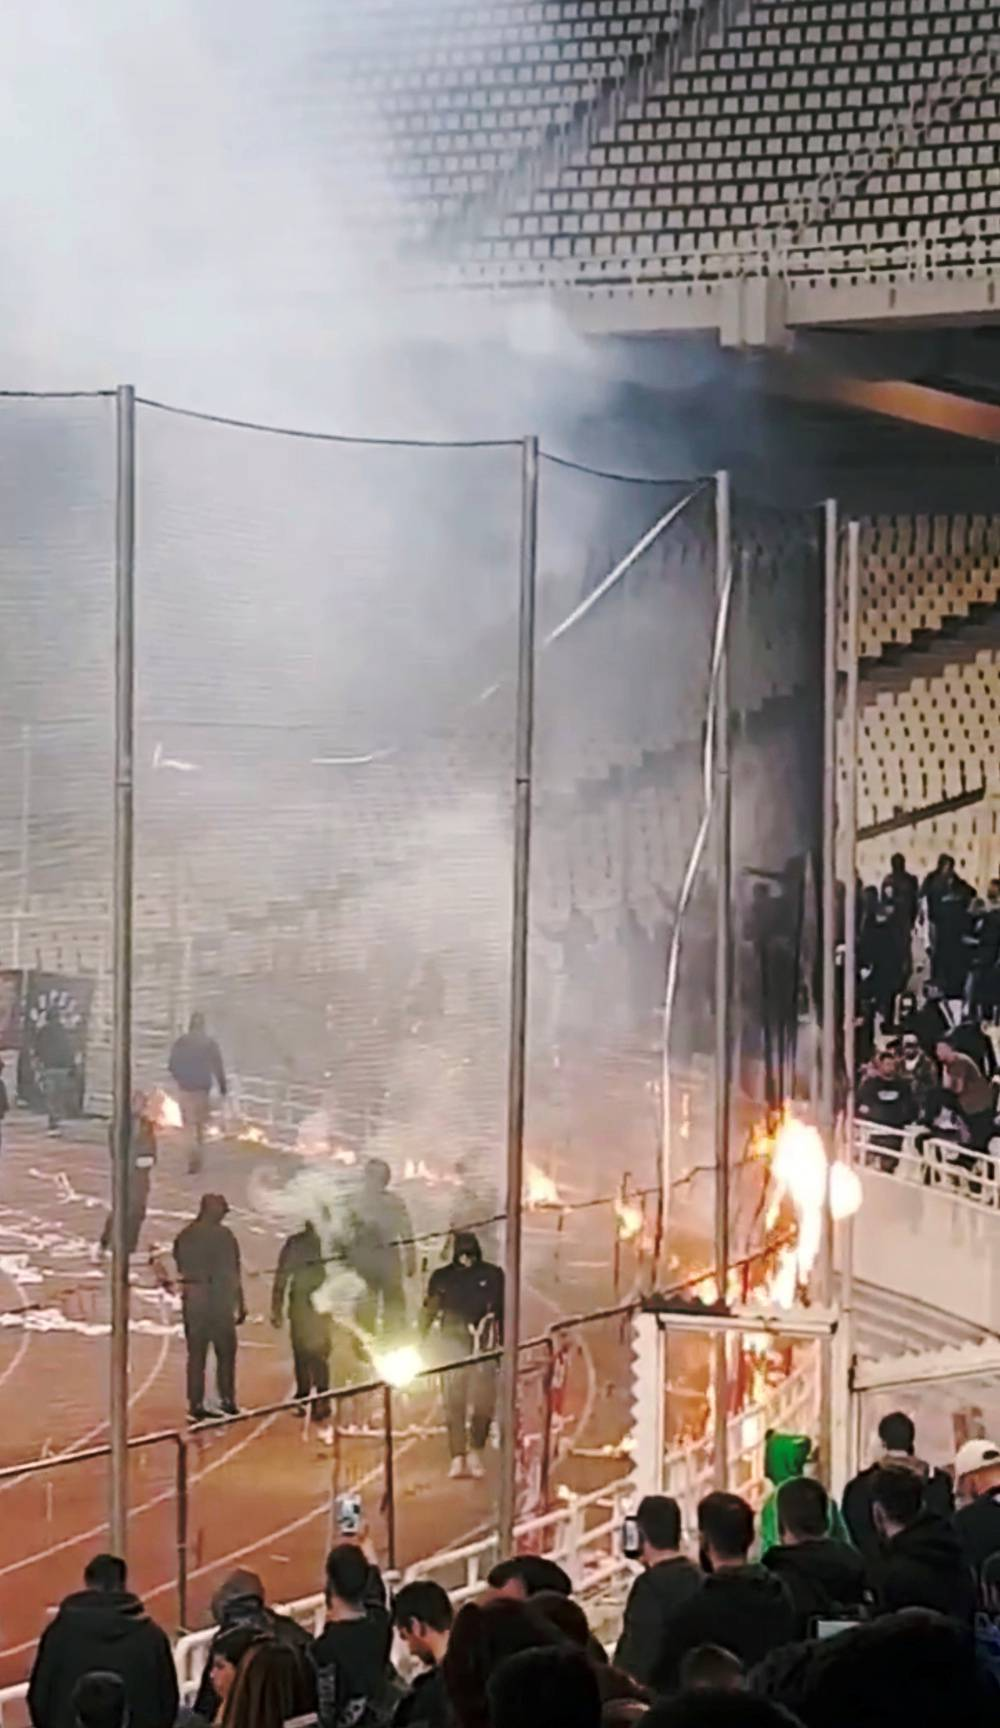 Panathinaikos fans burn flags during their Super League match at the OAKA Spiros Louis stadium in Athens